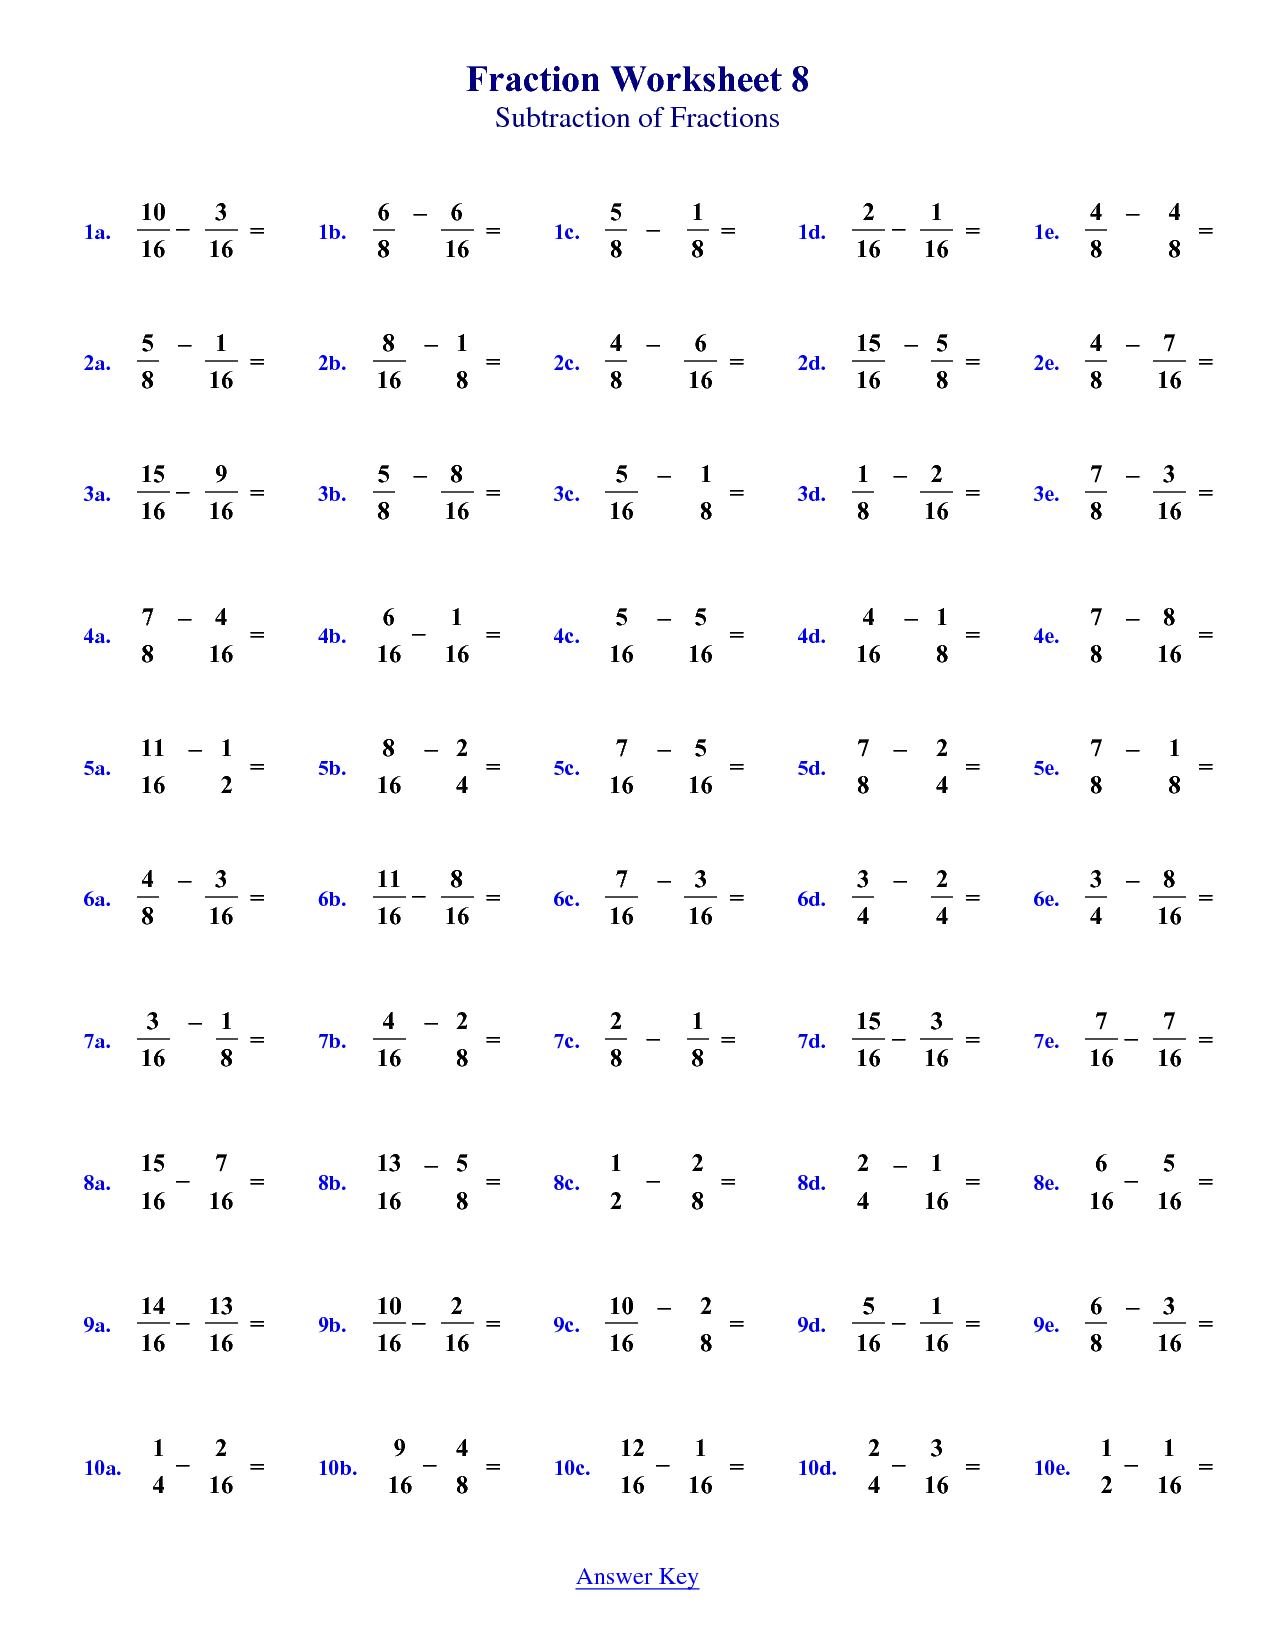 4th Division Worksheet